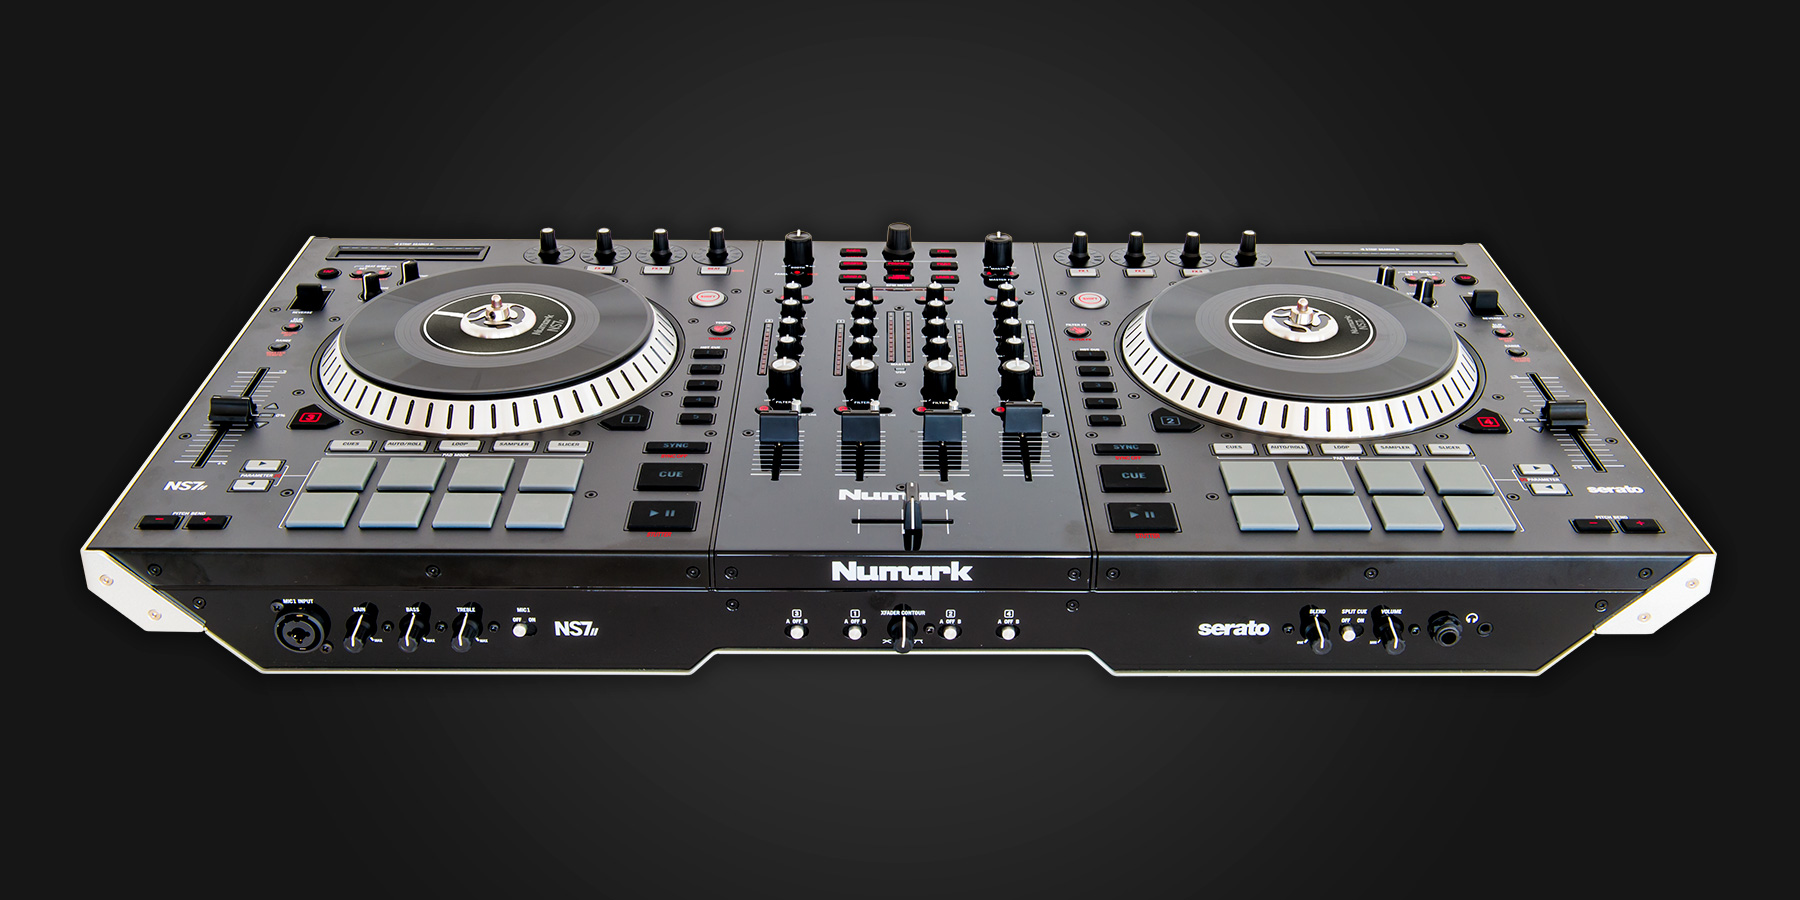 Numark NS7 II - Serato DJ Hardware